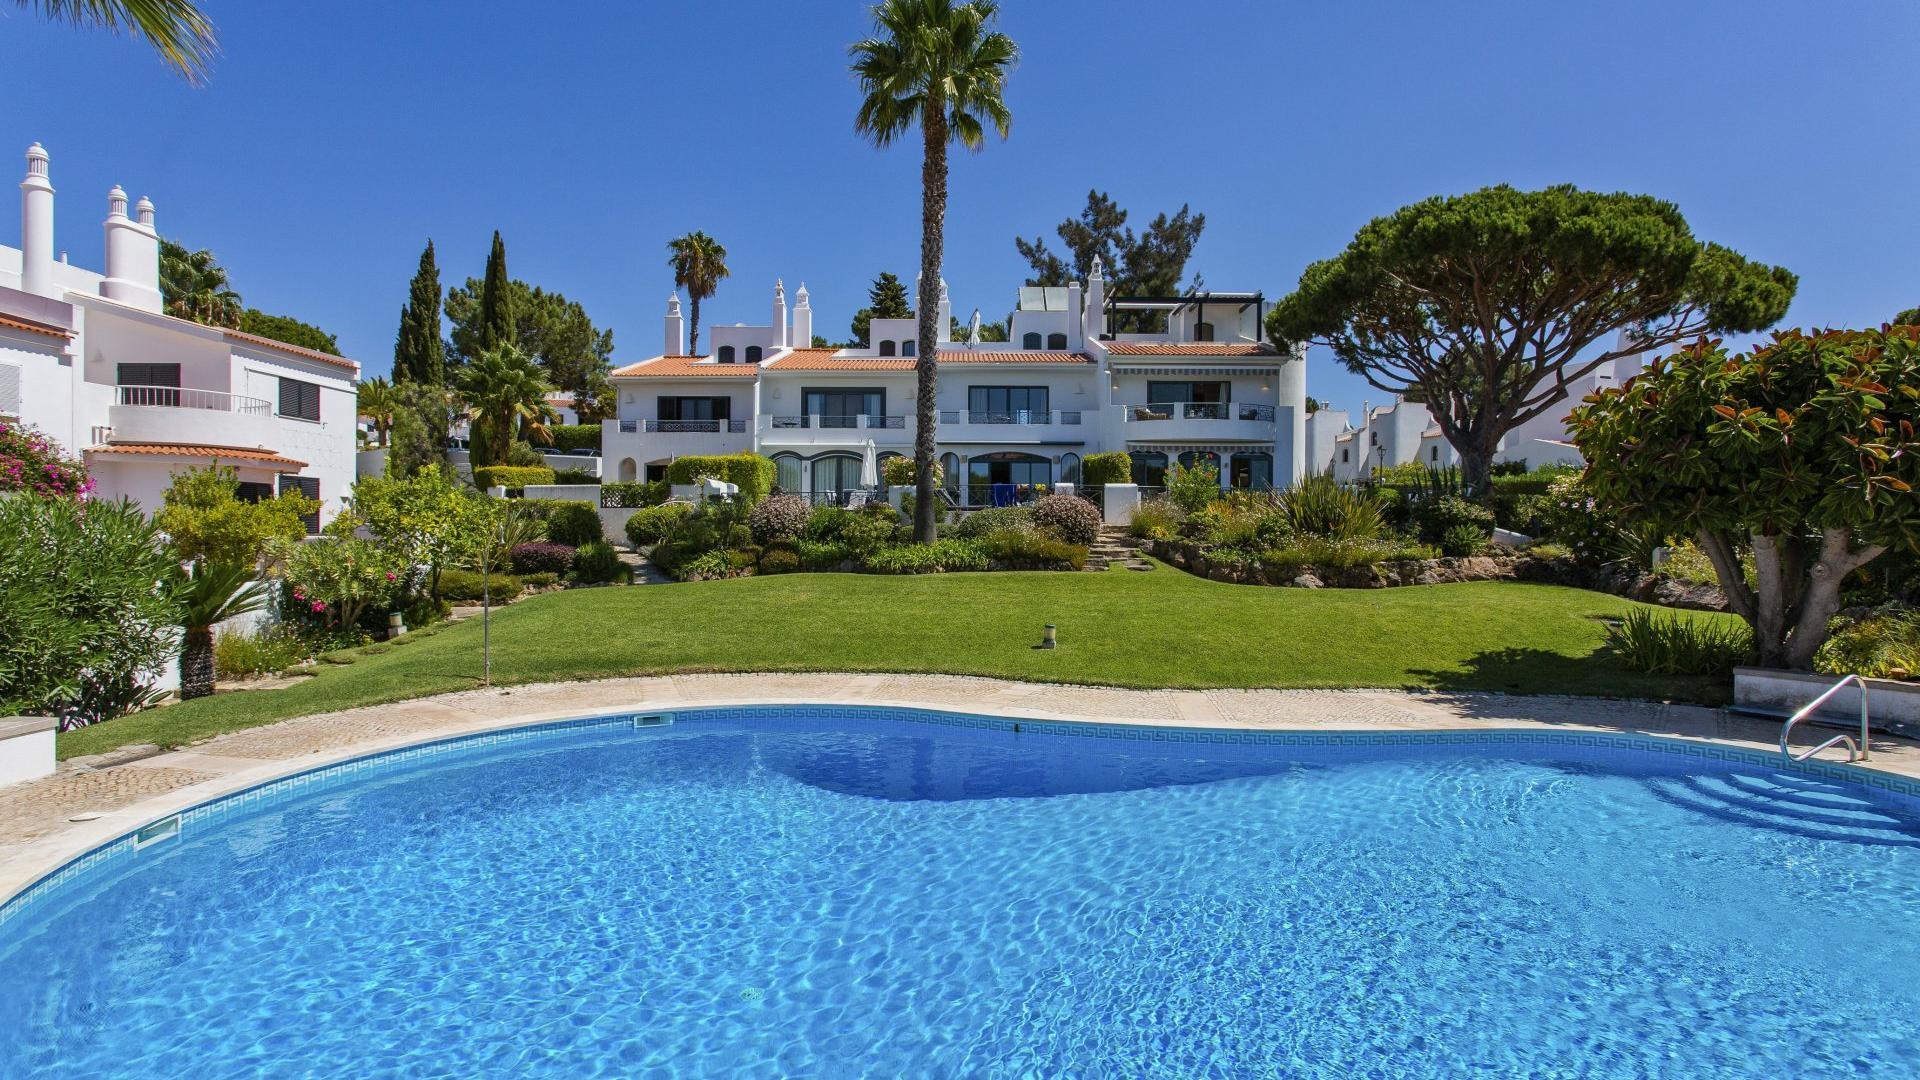 Villa Summer Haze - Lakeside Village, Quinta do Lago, Algarve - Villa_Summer_Haze_Exterior_1.jpg